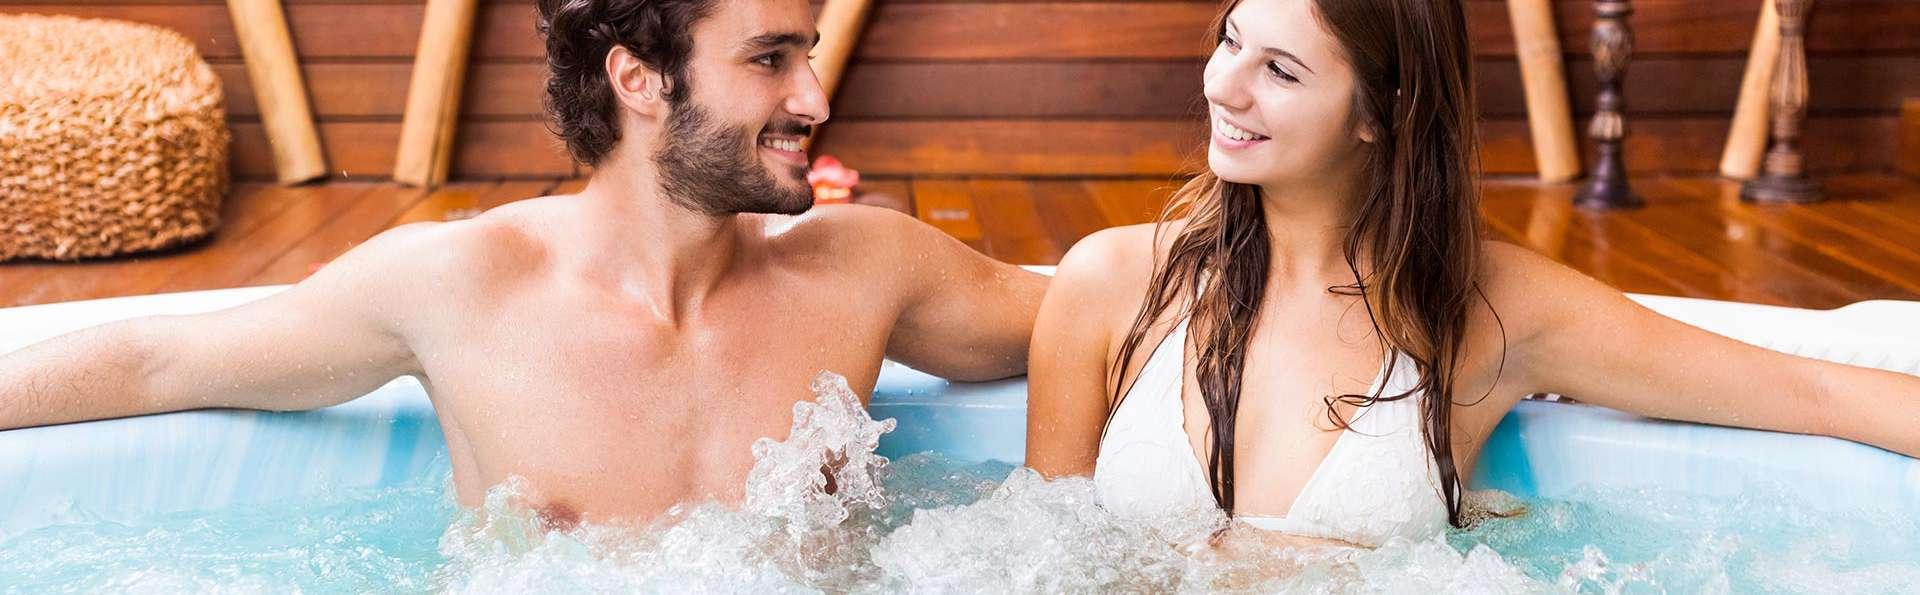 Relax total en pareja con Spa Privado y cóctel en pleno Montseny (Adults Only)